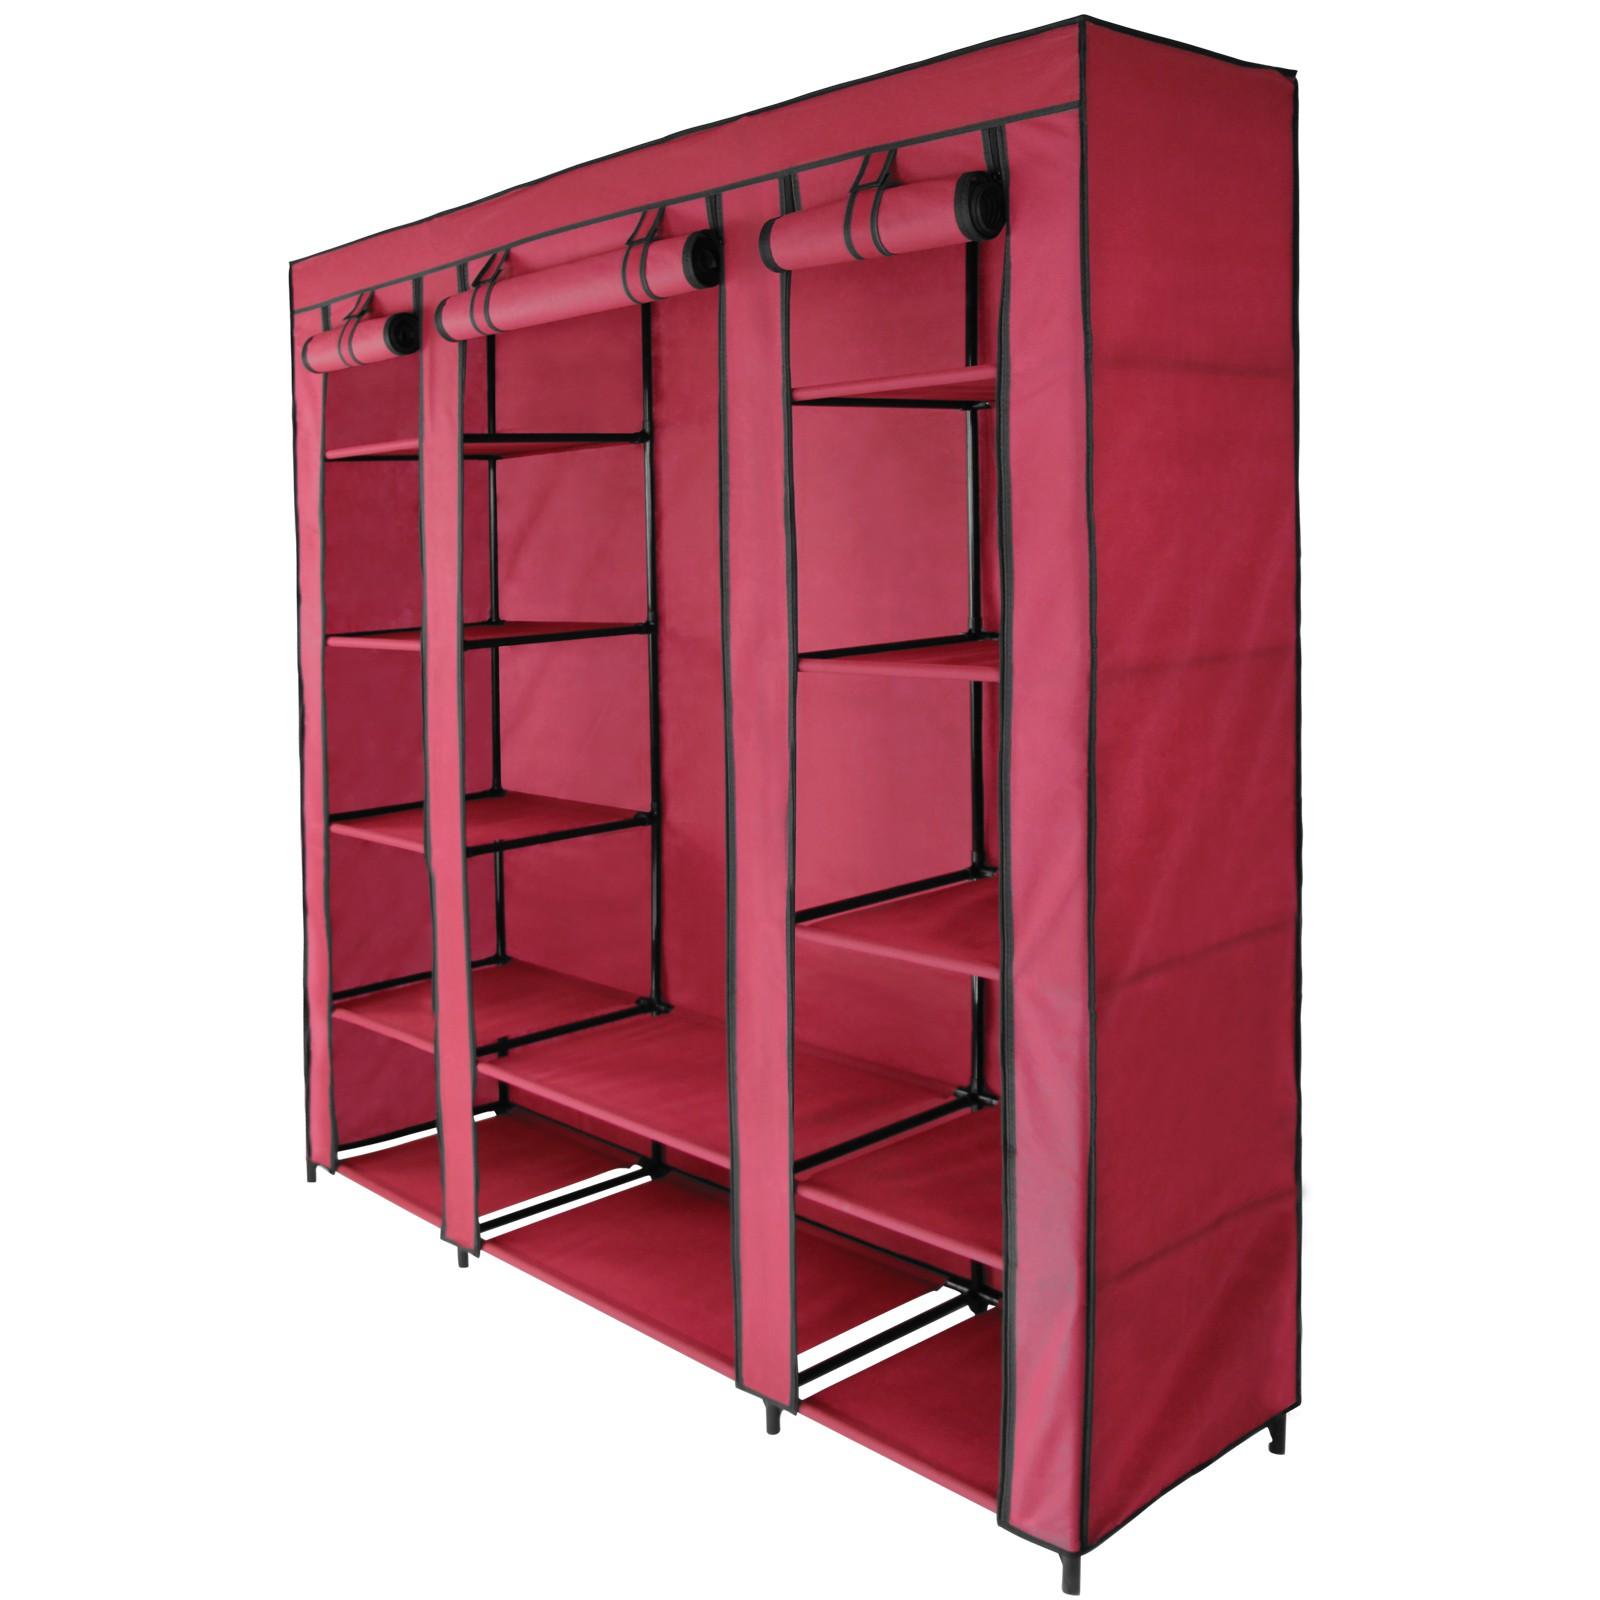 faltschrank stoffschrank maxi 150 x 45 x 175 cm kleiderschrank garderobe faltbar ebay. Black Bedroom Furniture Sets. Home Design Ideas